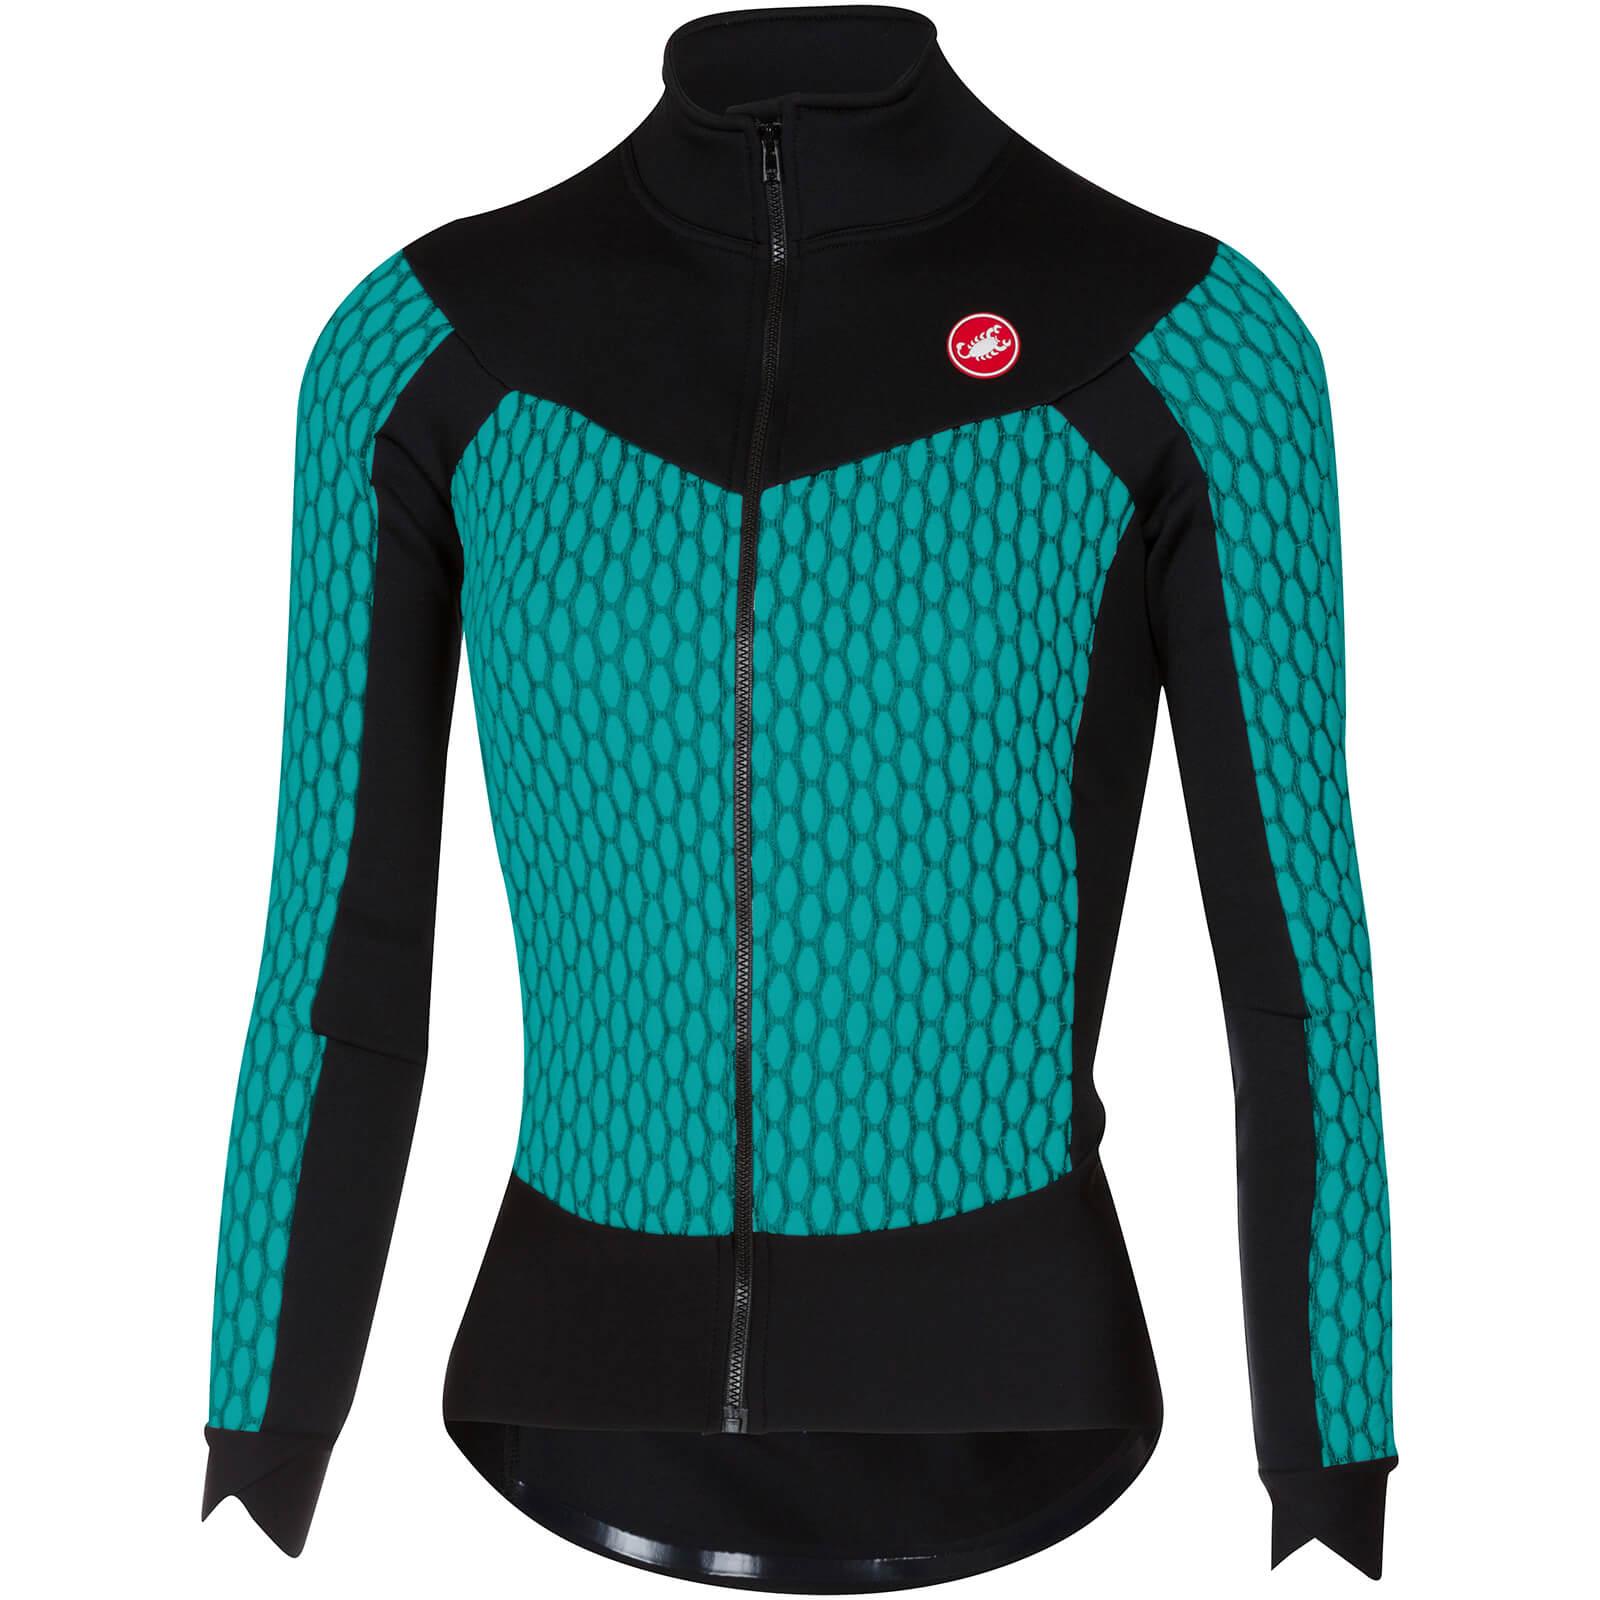 Castelli Women s Sfida Long Sleeve Jersey - Turquoise  559e9b2f3